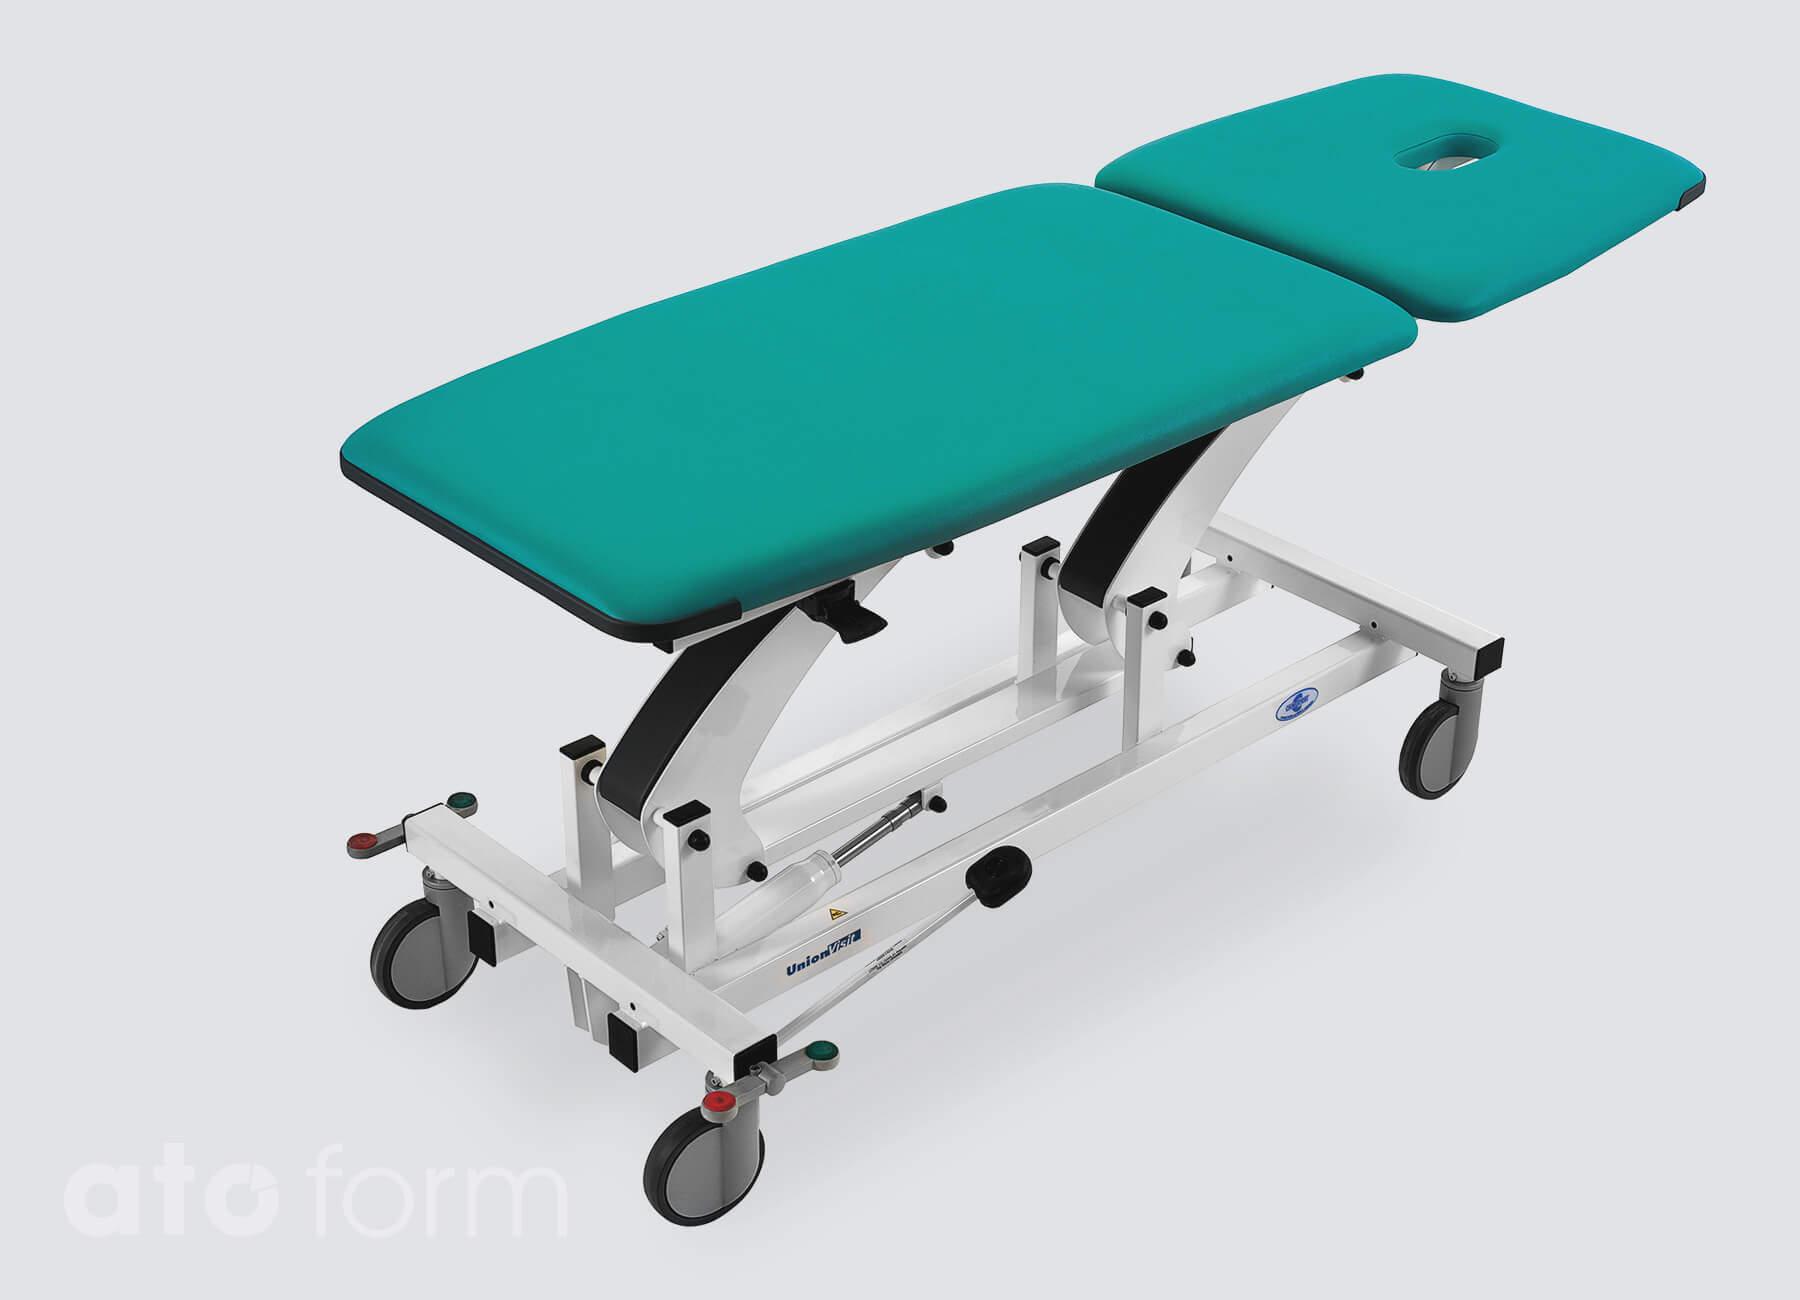 Therapieliege Visit Transfer